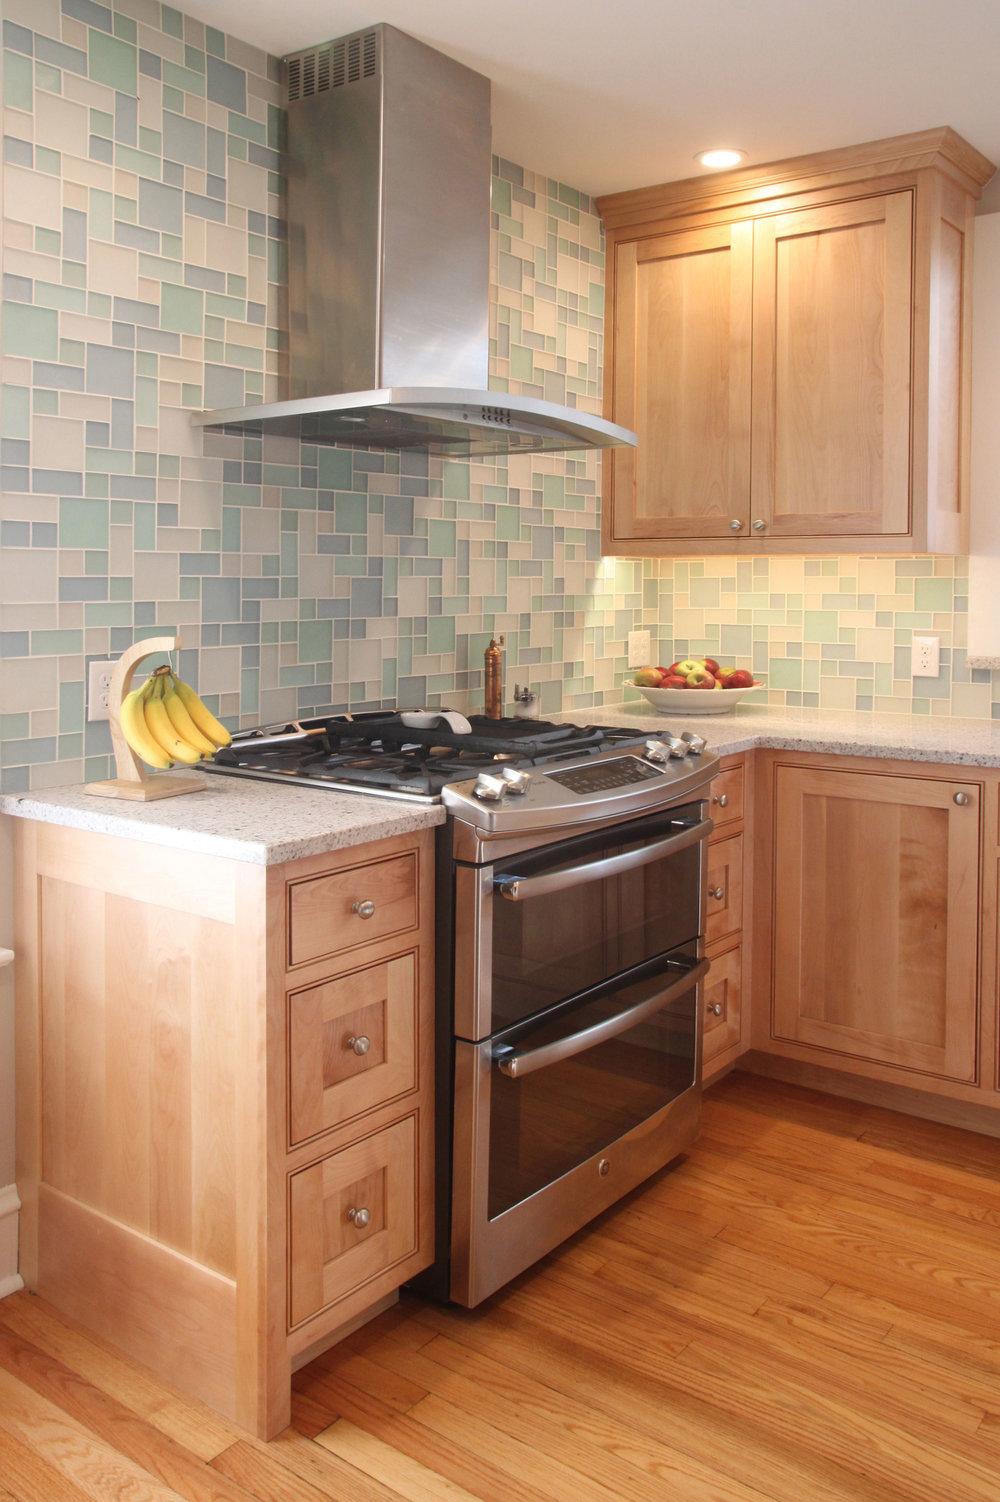 Glass tile brightens kitchen